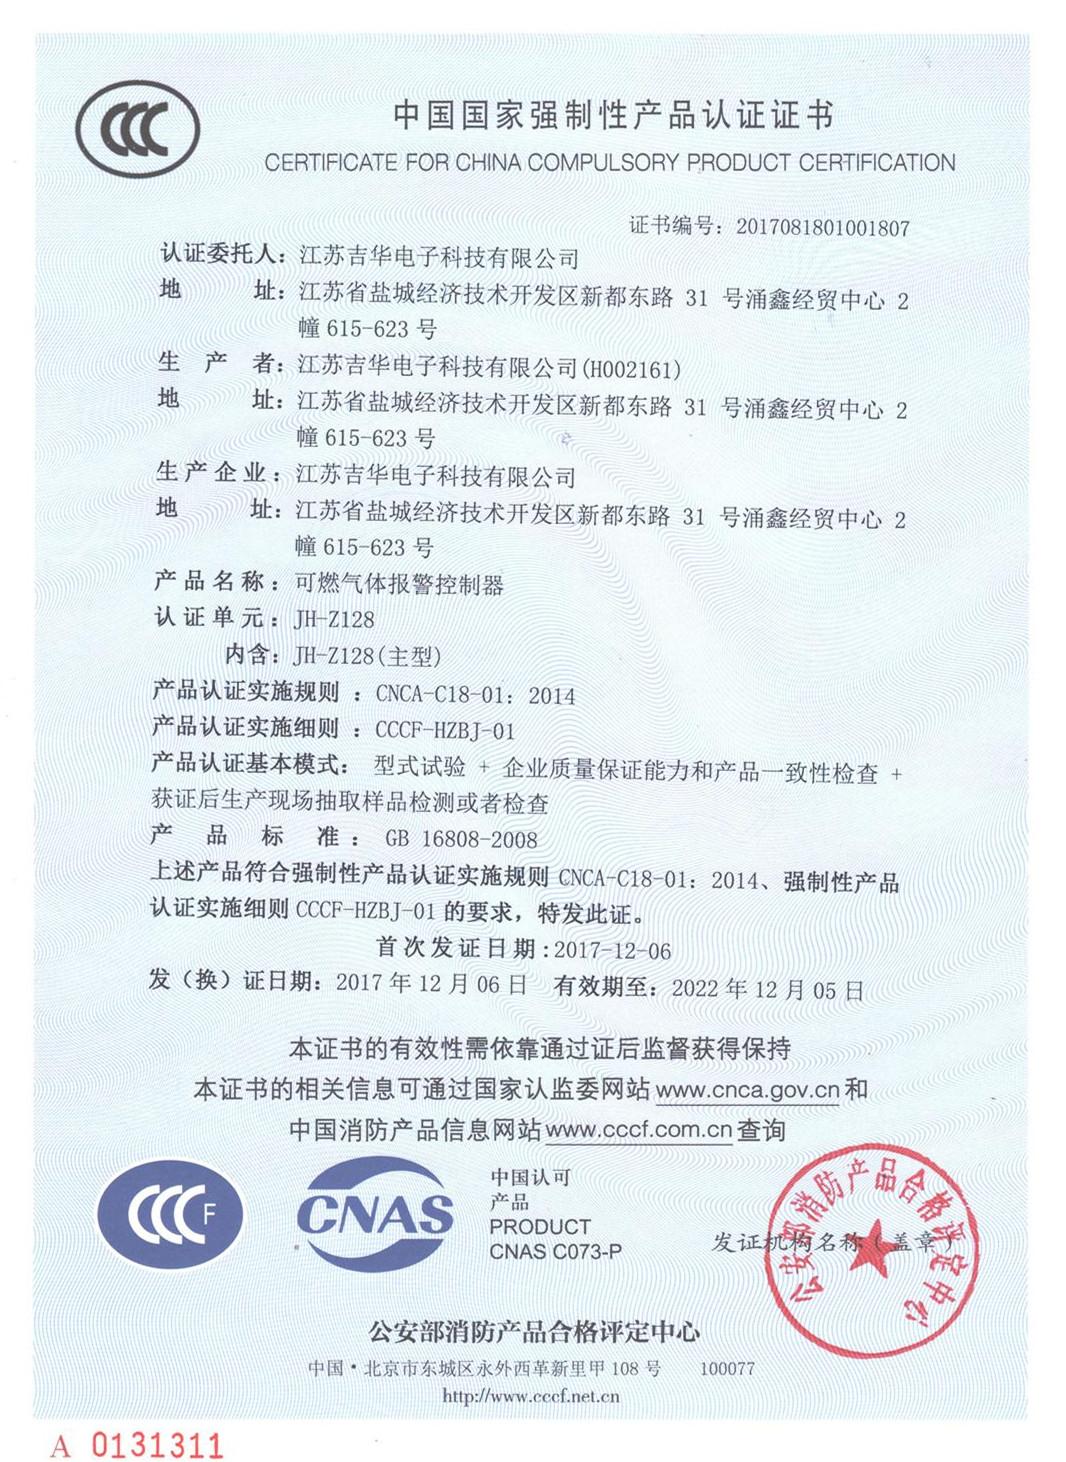 JH-Z128 CCC证书